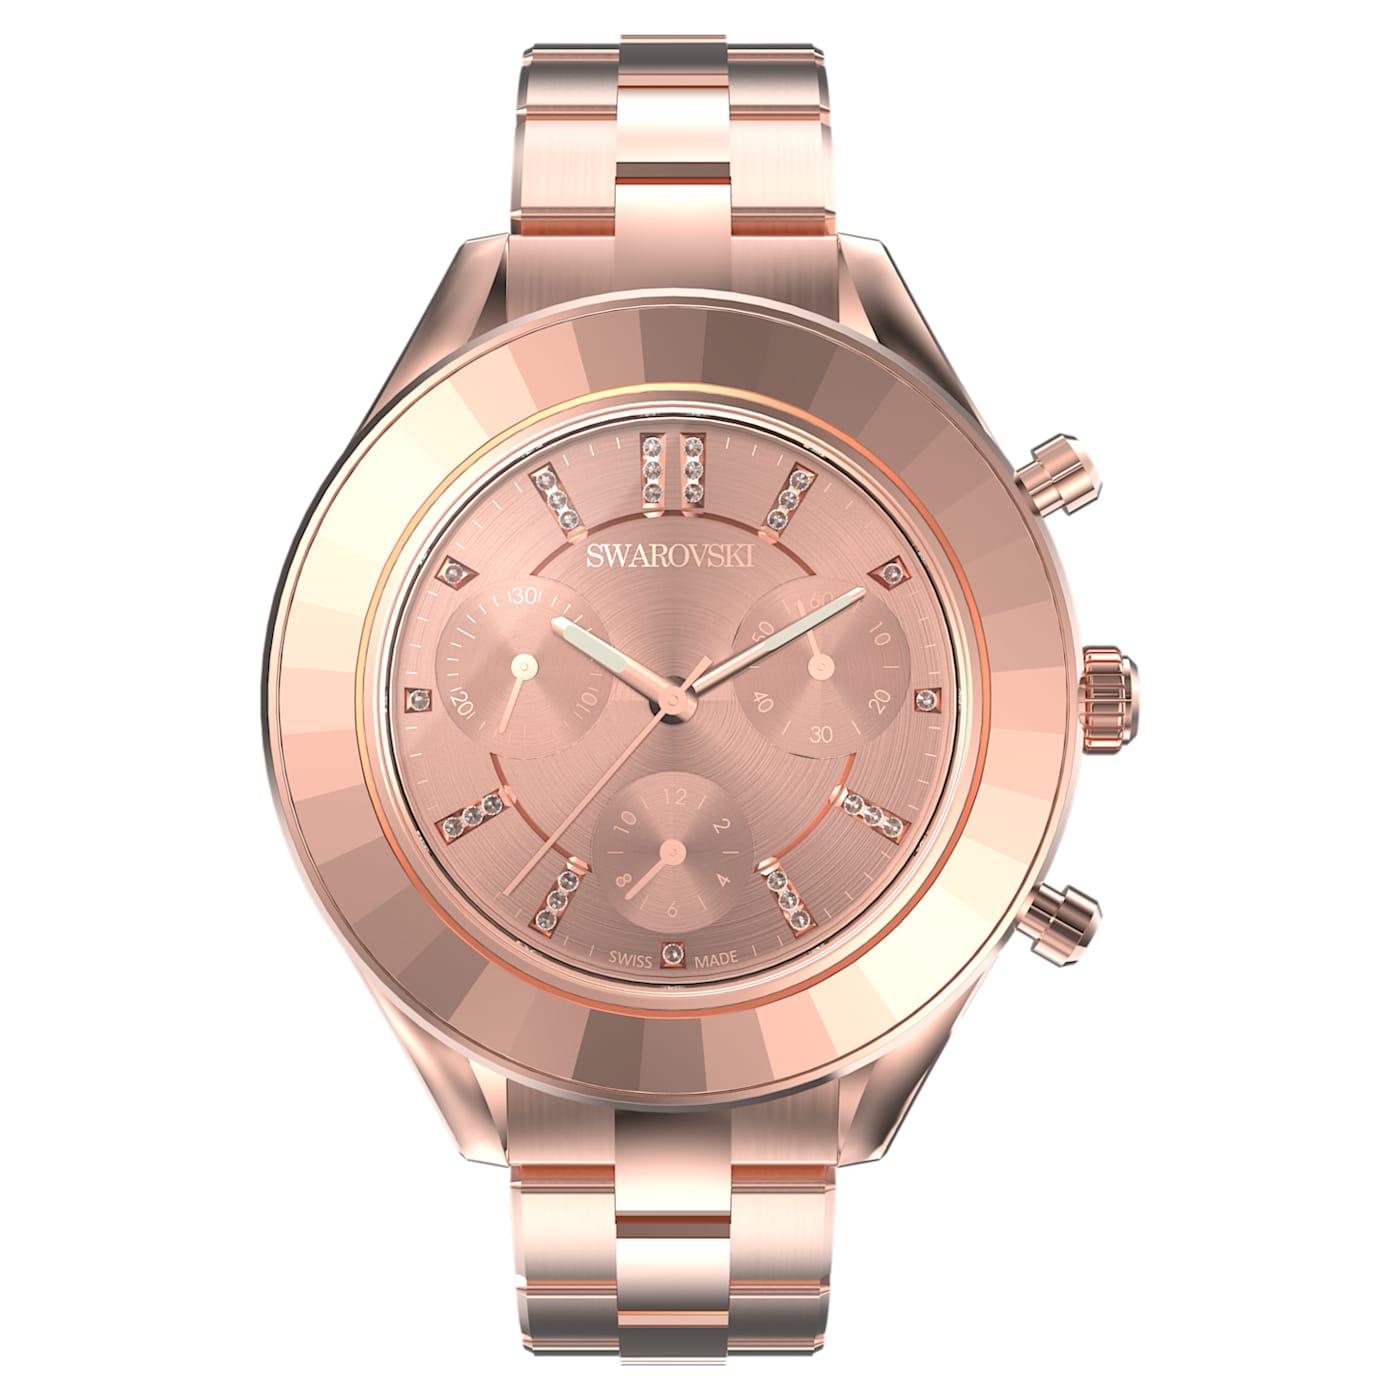 Montre Octea Lux Sport Bracelet en métal, Ton or rose, PVD doré rose, Swarovski